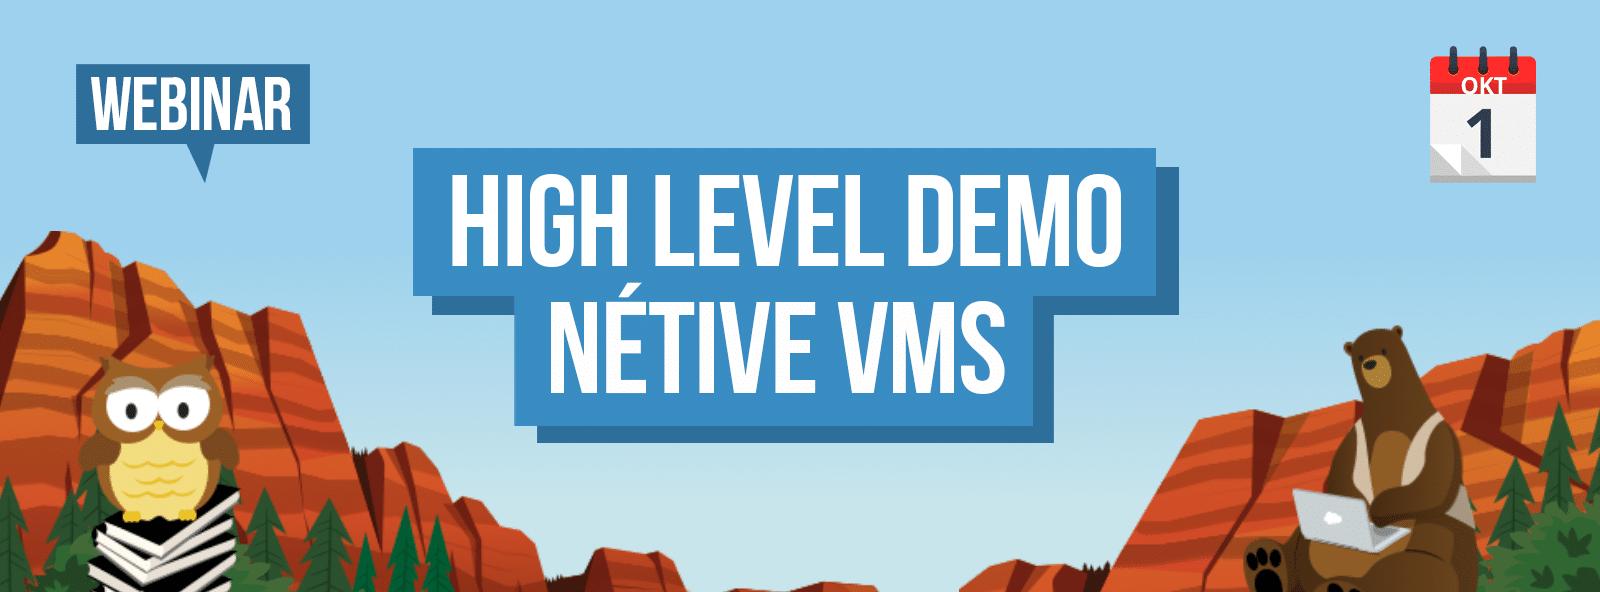 Webinar Netive VMS High Level Demo